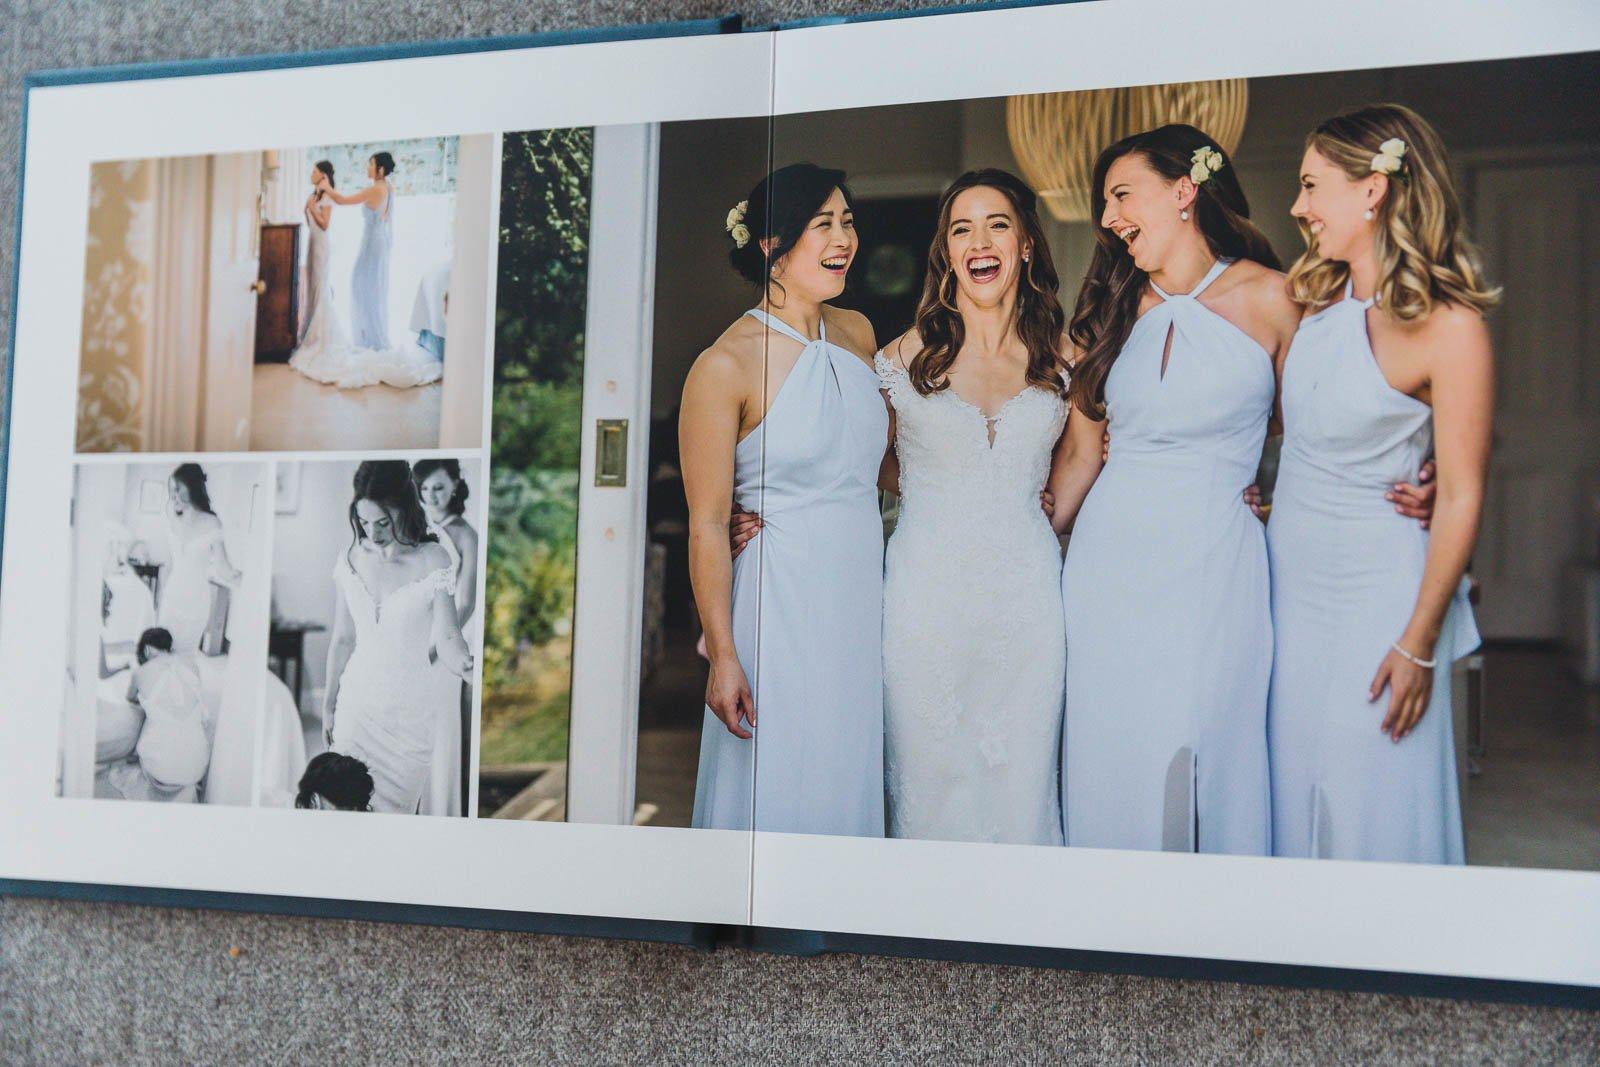 Wedding-Photographer-Surrey-Carl-Glancey-Photography-folio-albums-25 10